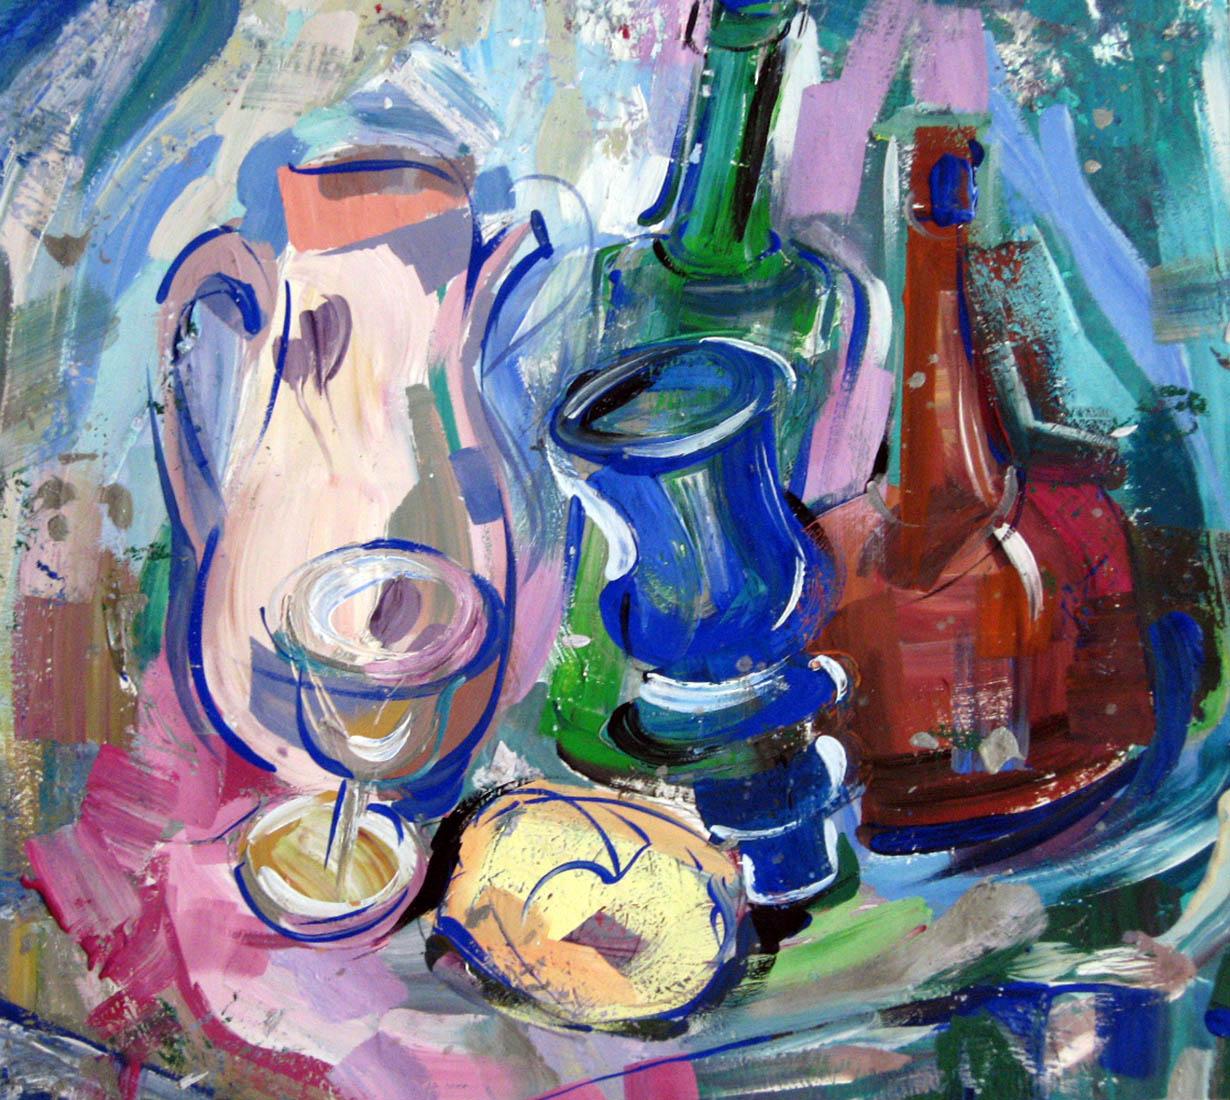 Polina-Shubkina-Paintings-023.jpg